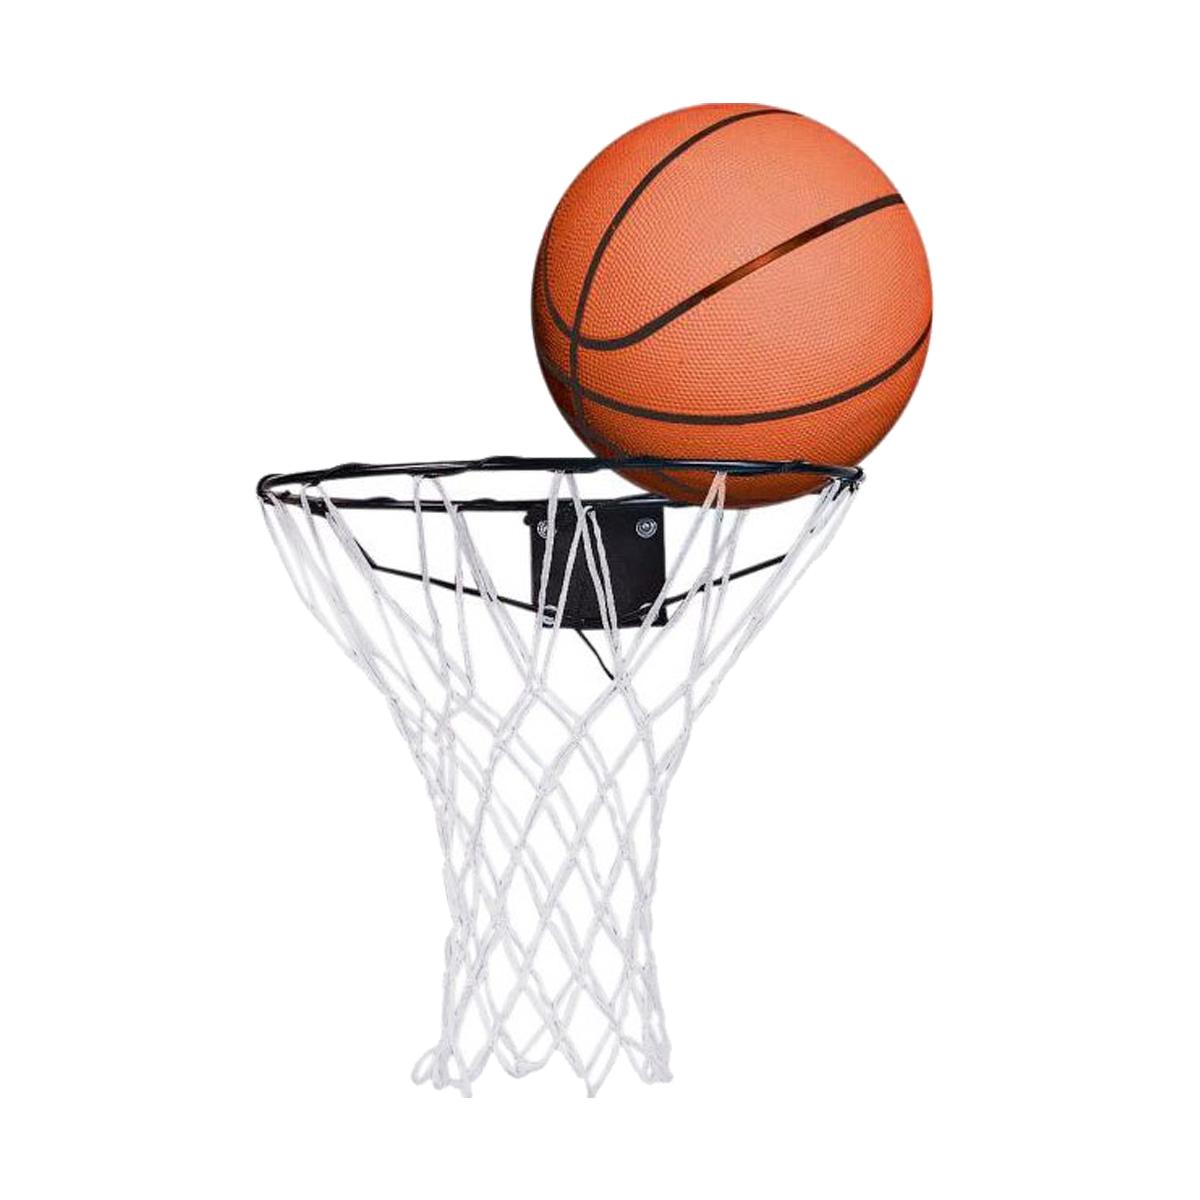 Ebay Outdoor Basketball Ring